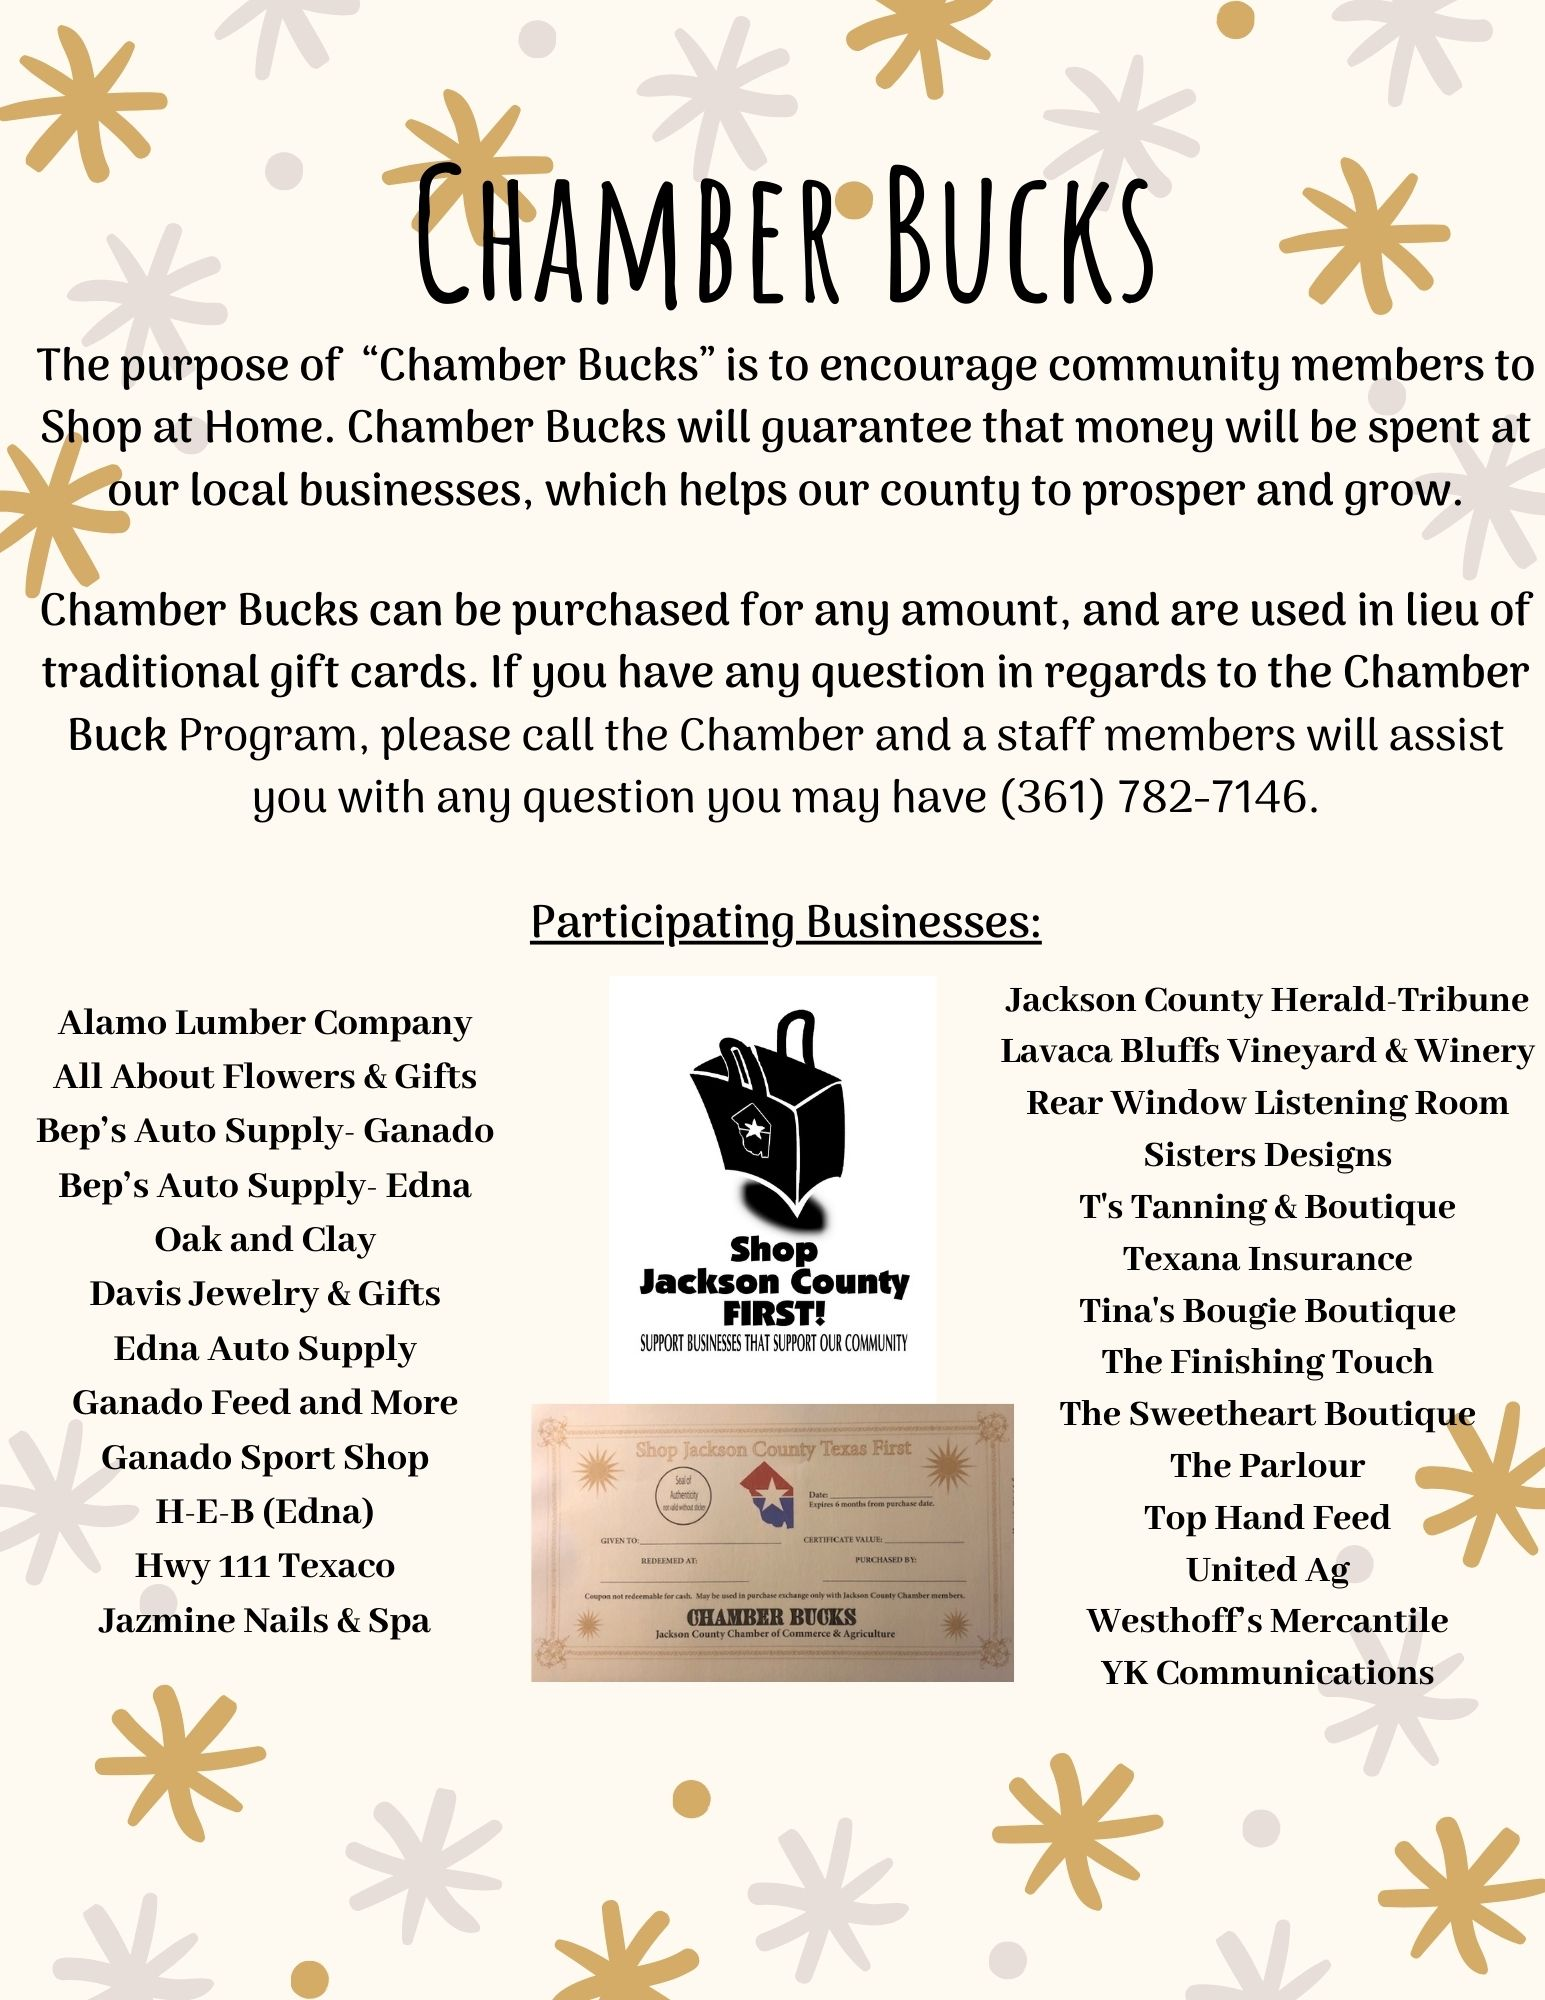 Chamber-Bucks-1.jpg